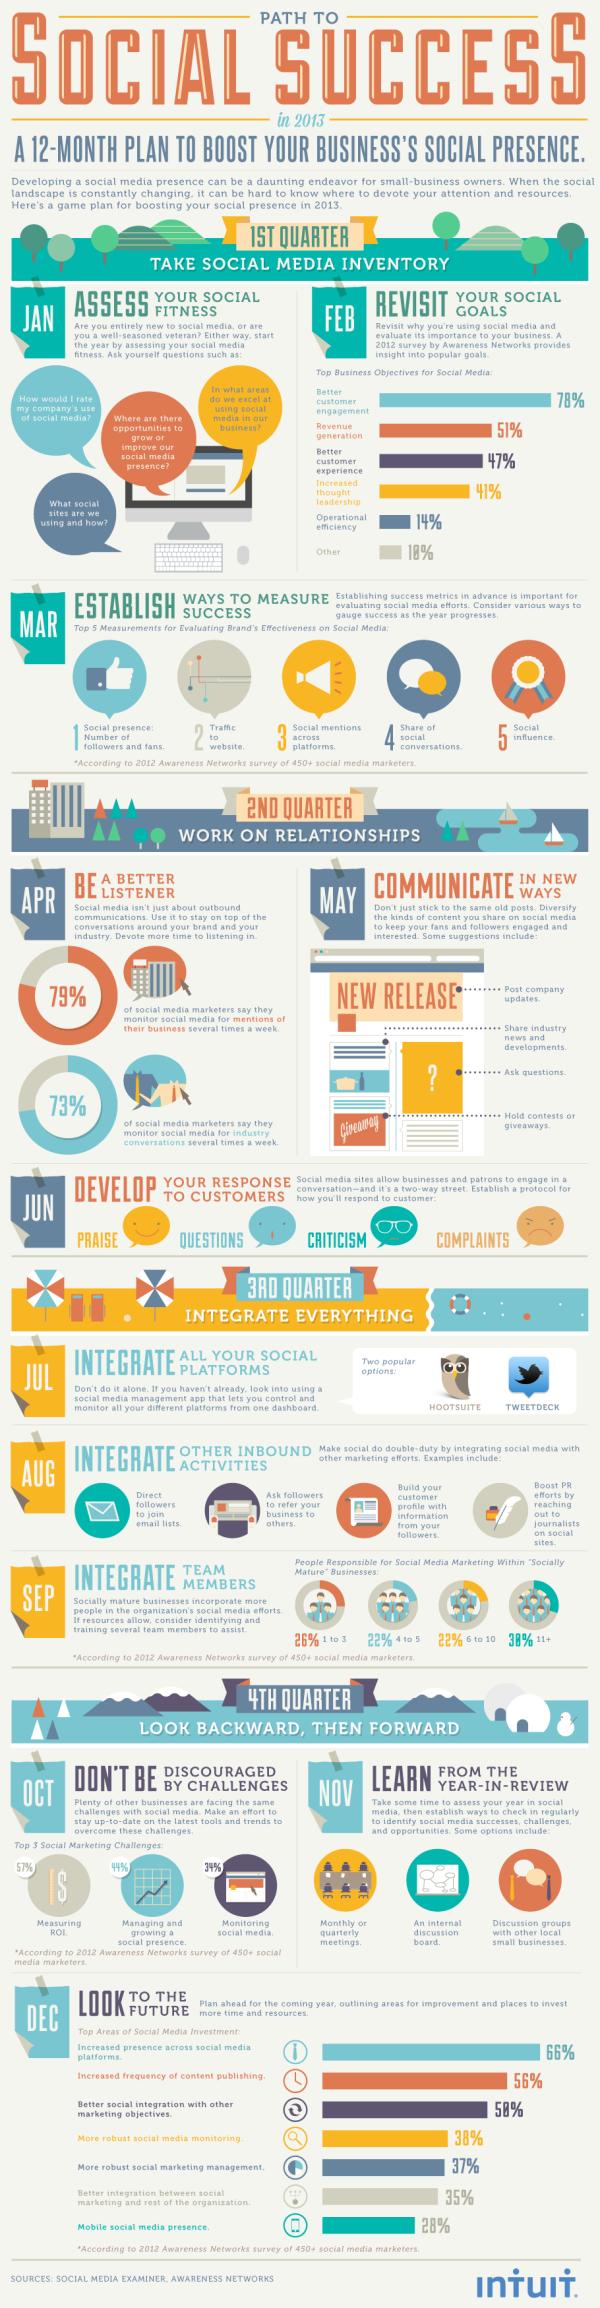 Intuit 2013 SocialRoadMap resized 600